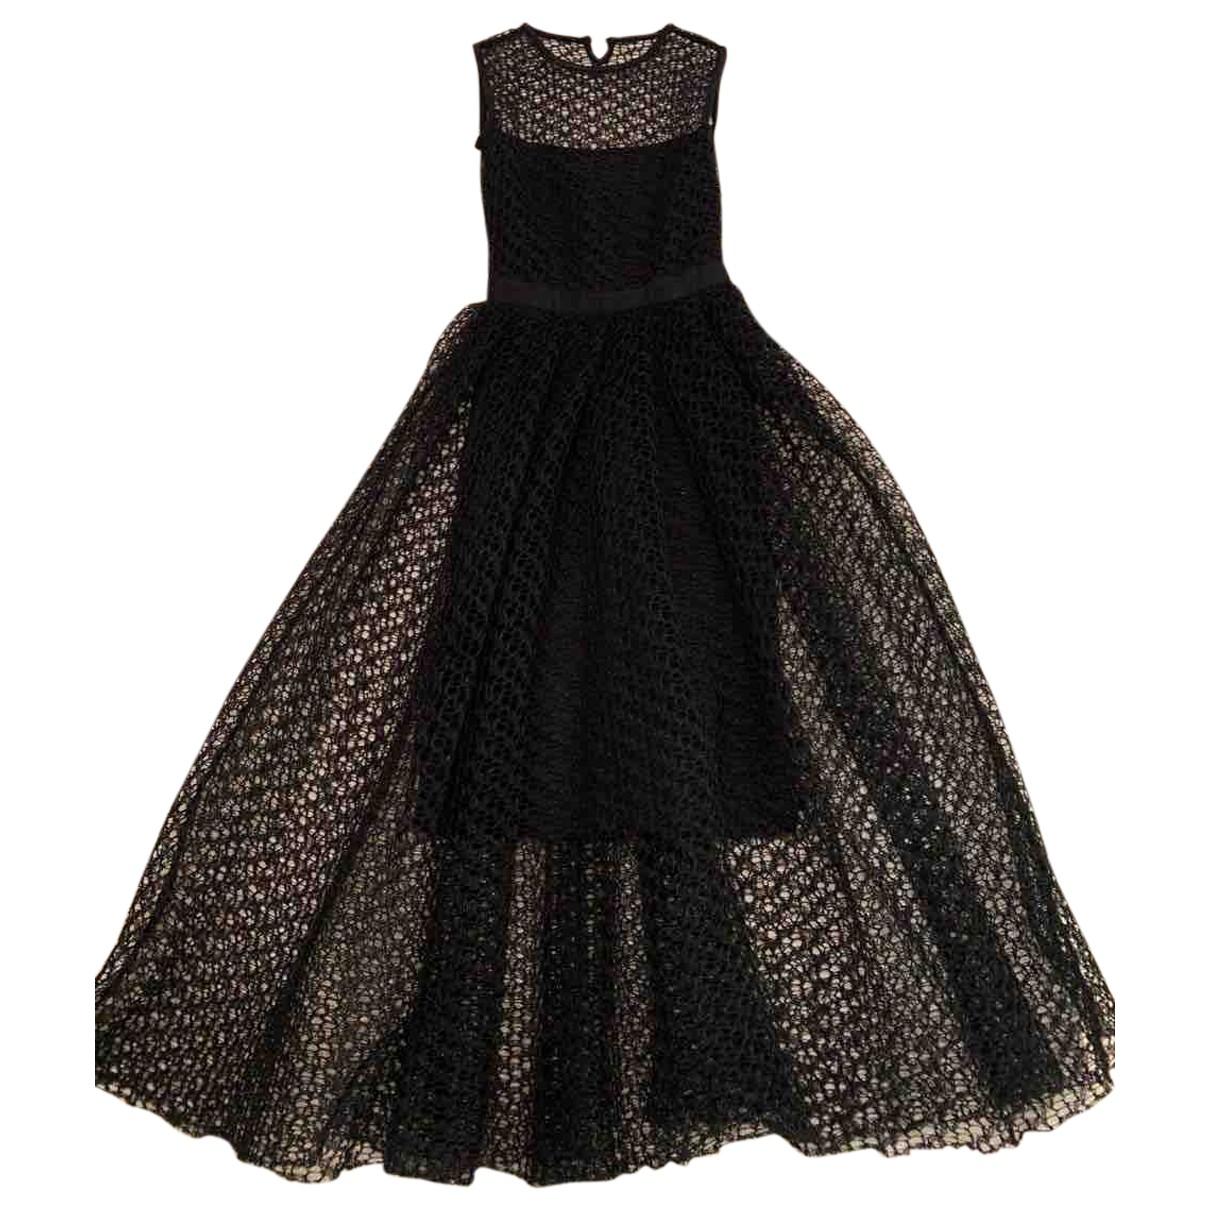 Dior \N Black Cotton dress for Women 38 FR